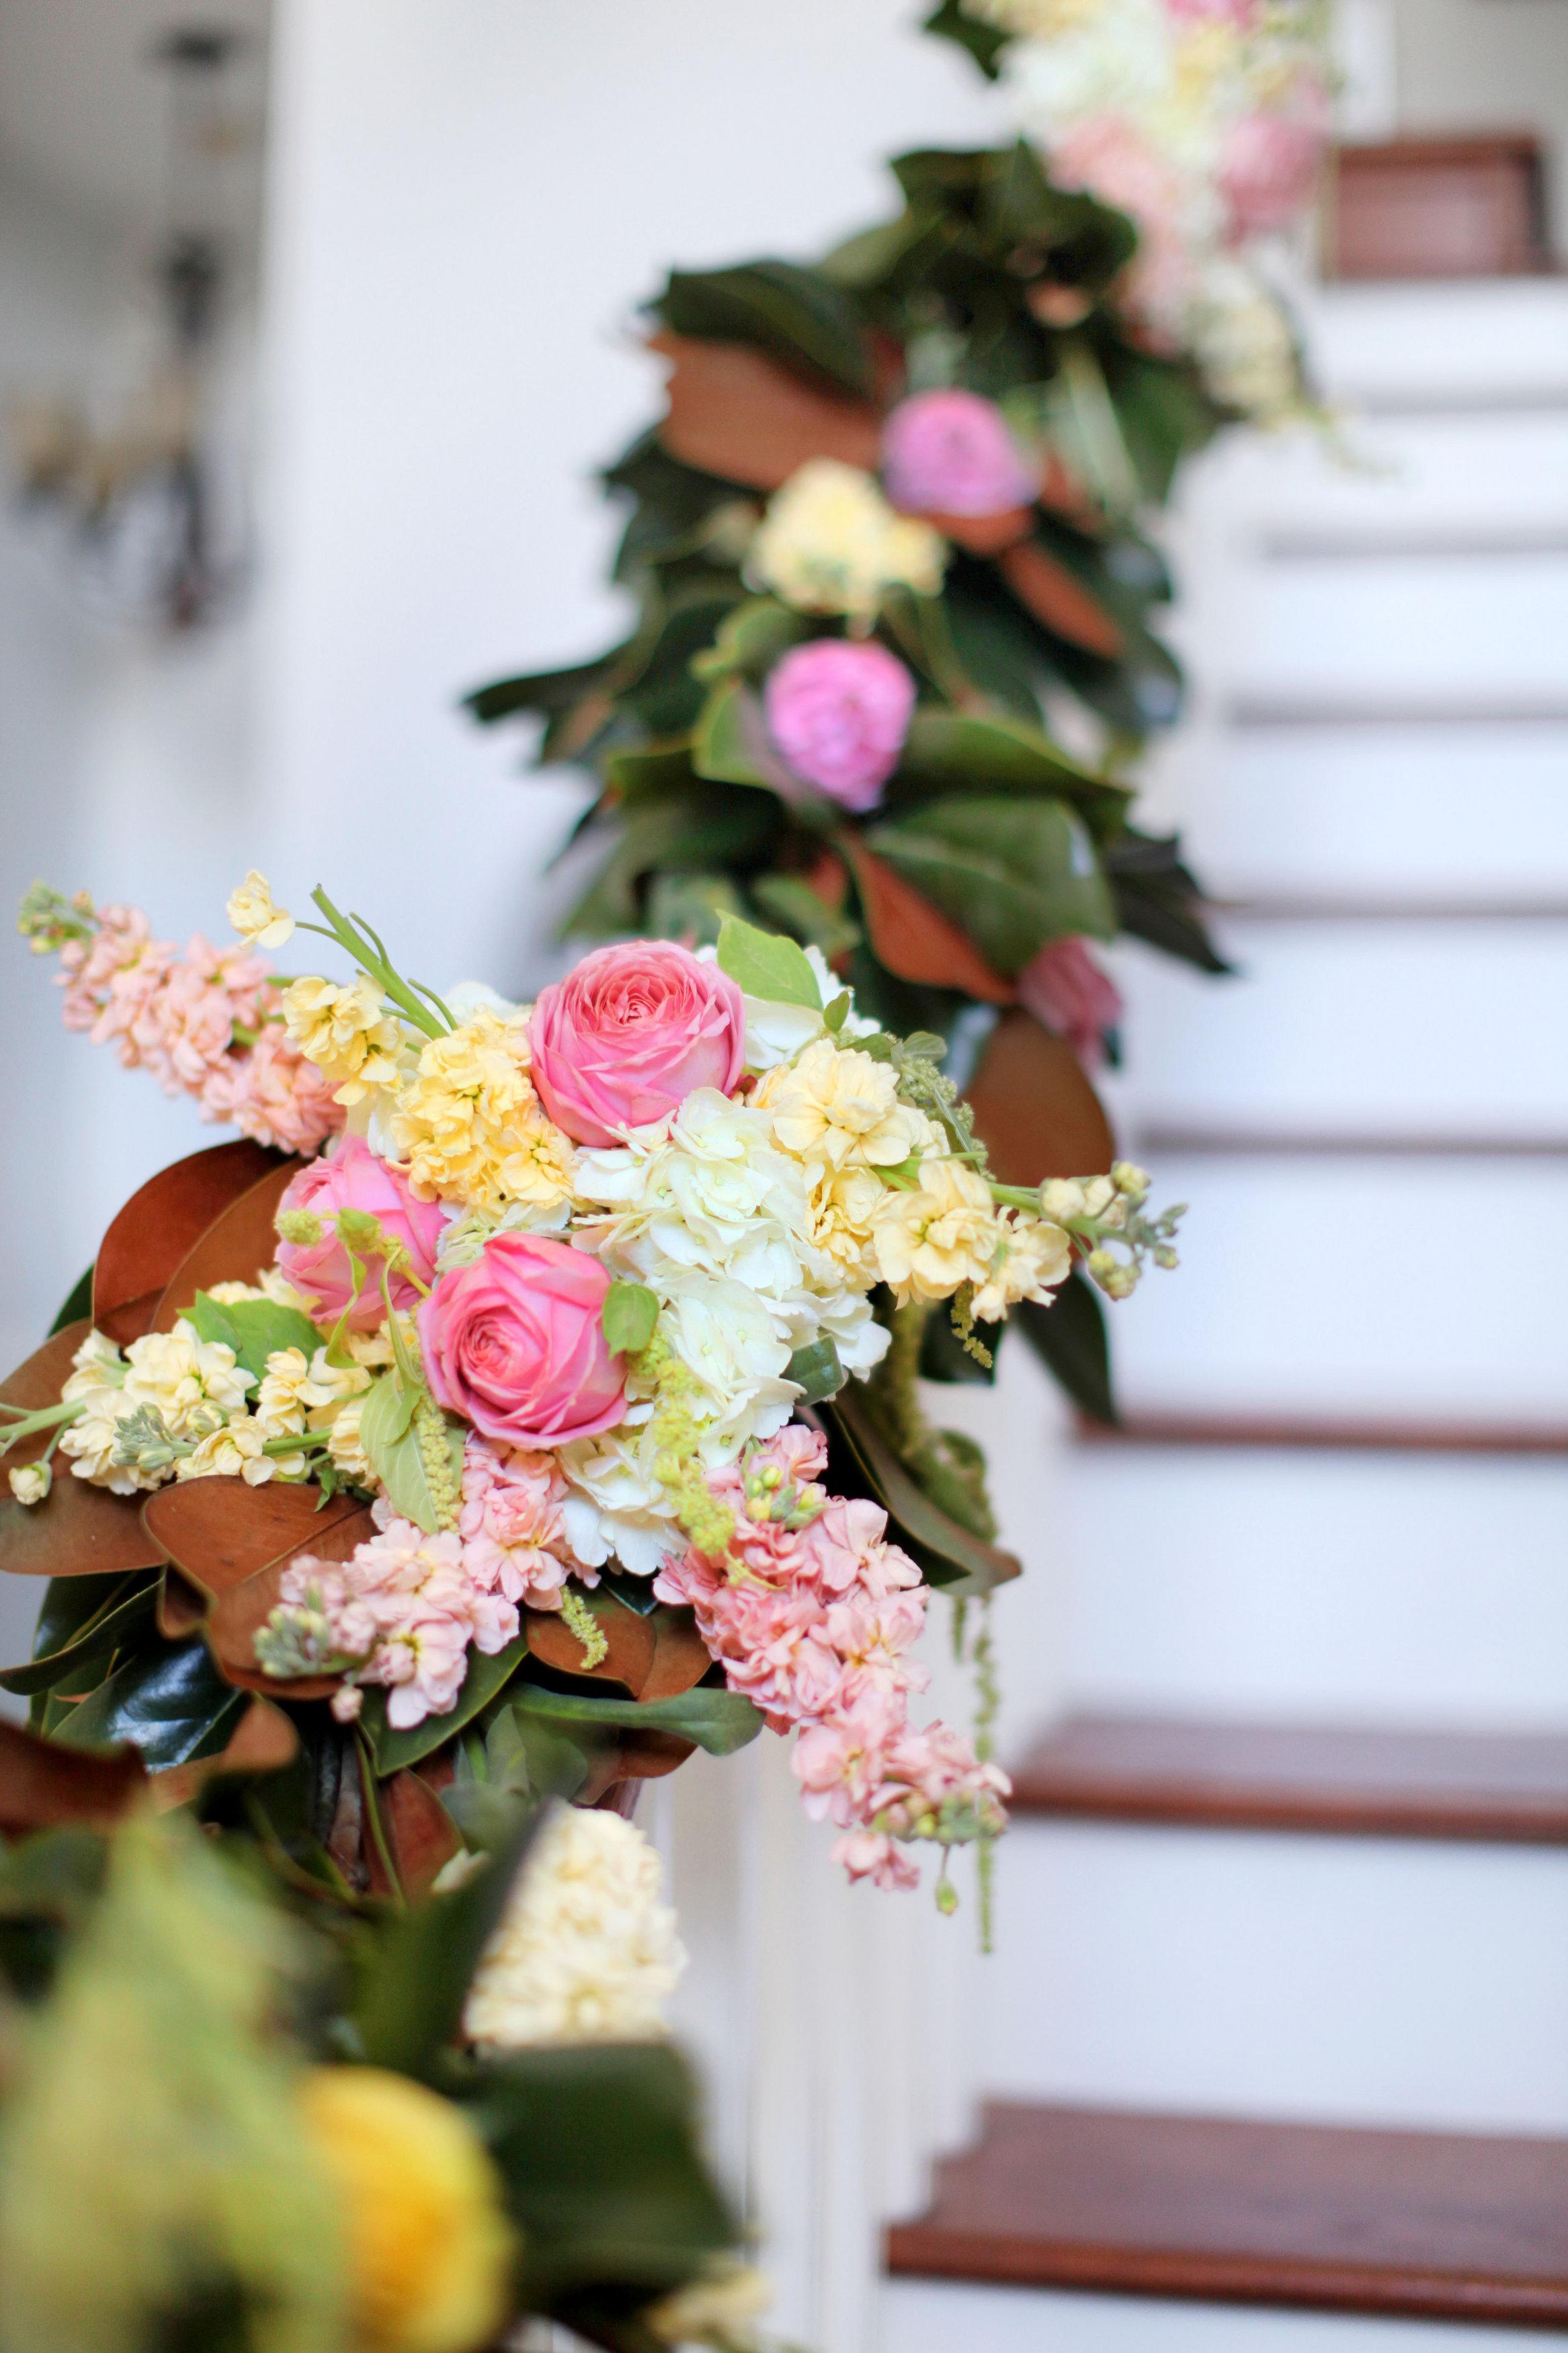 Wedding Gallery: Anna Christine Events, Orlando Florida Wedding Planner and Wedding Coordinator